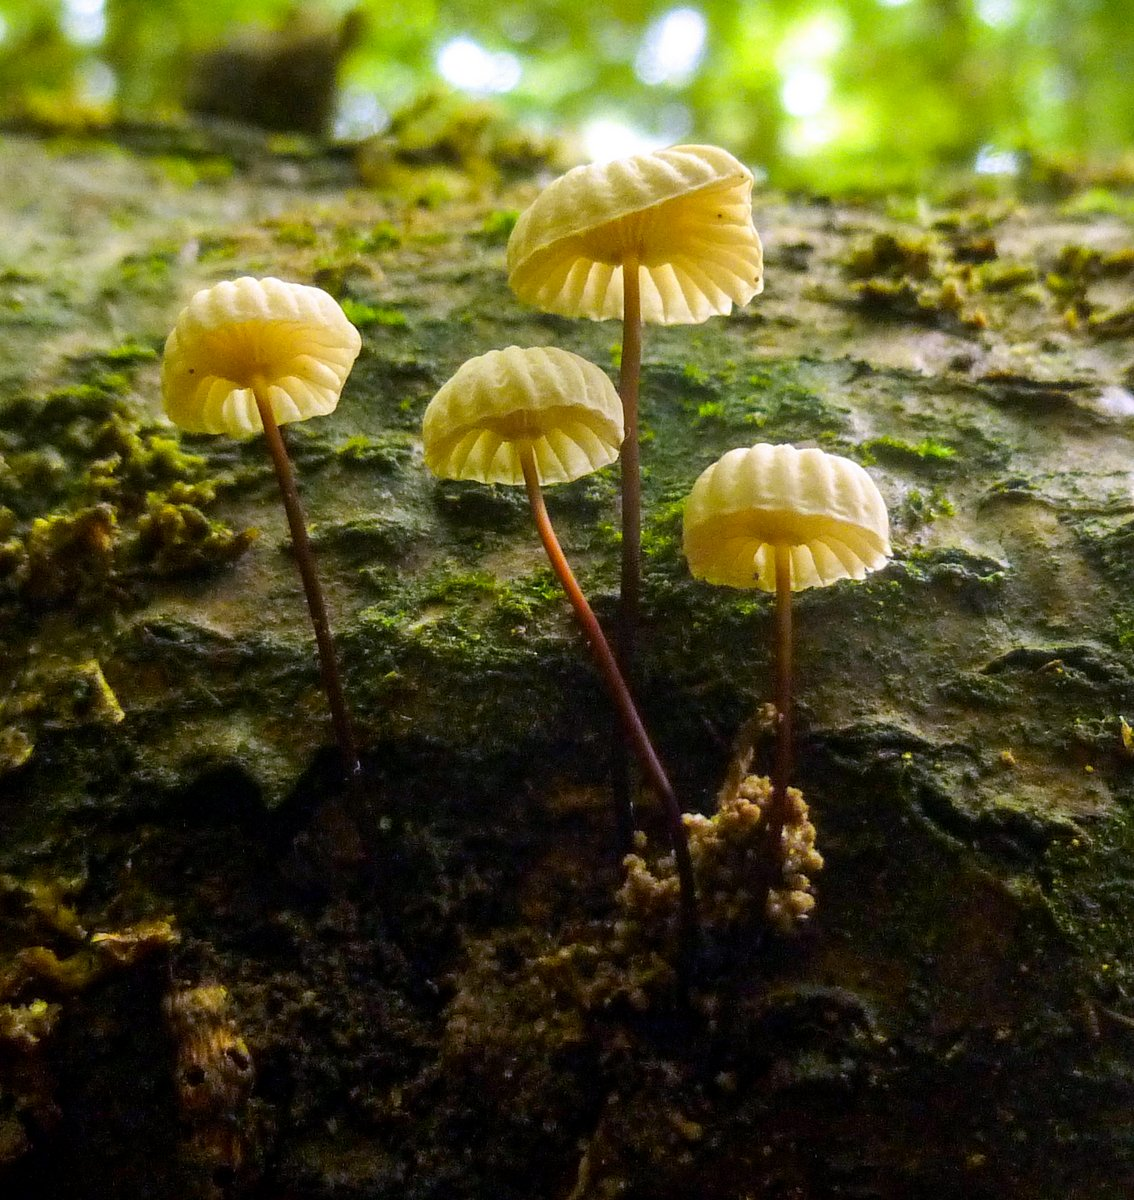 11. Pinwheel Mushrooms